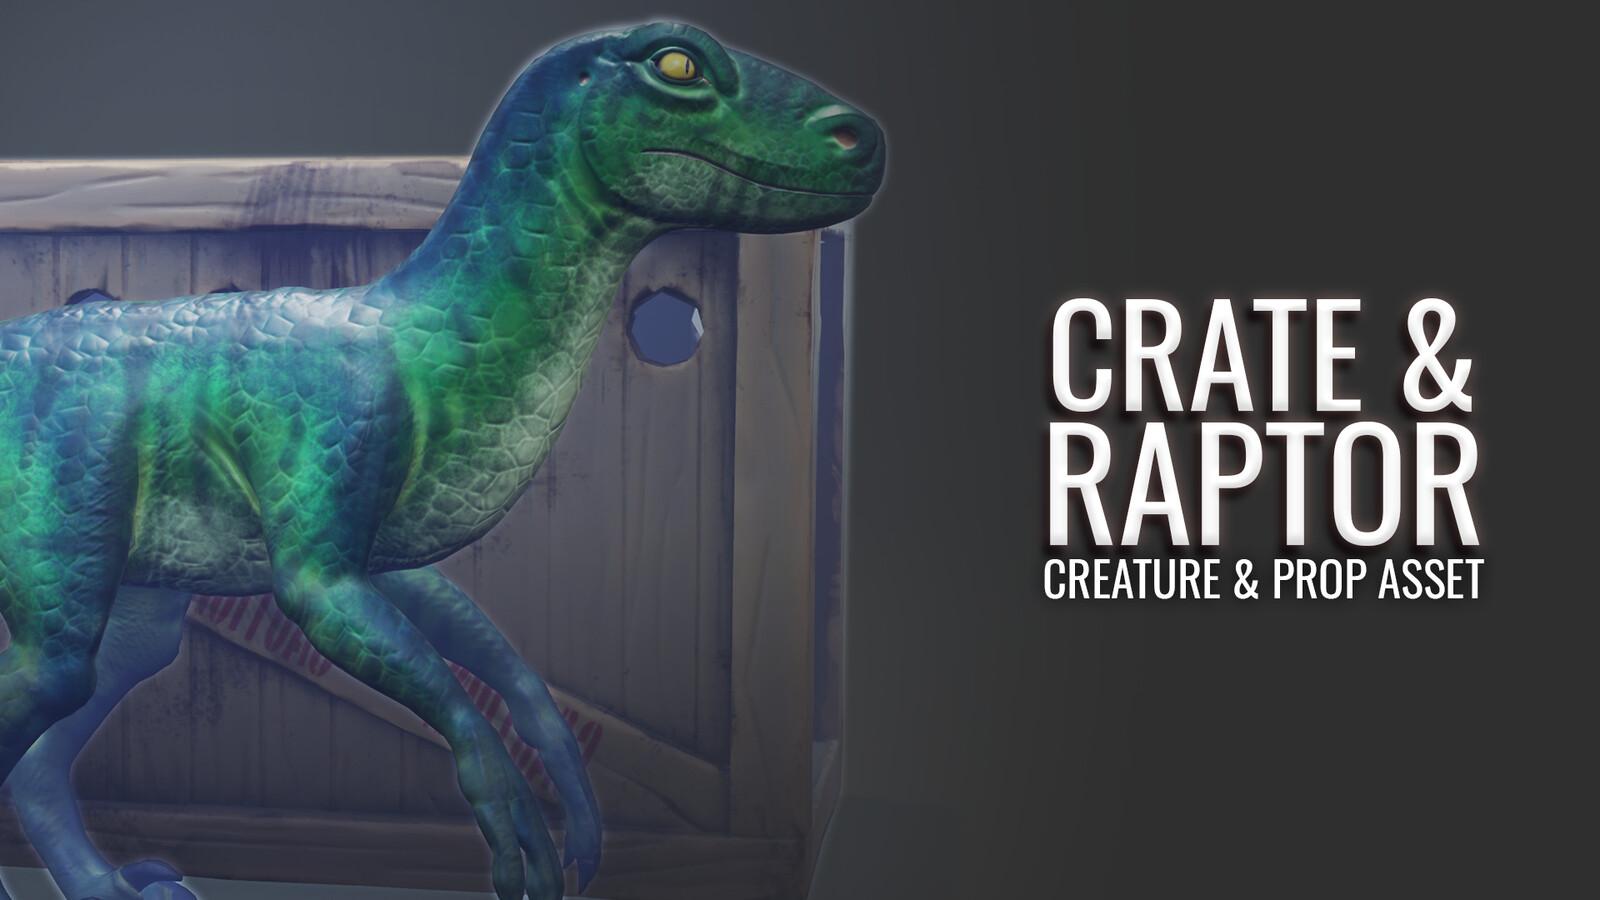 Raptor & Crate